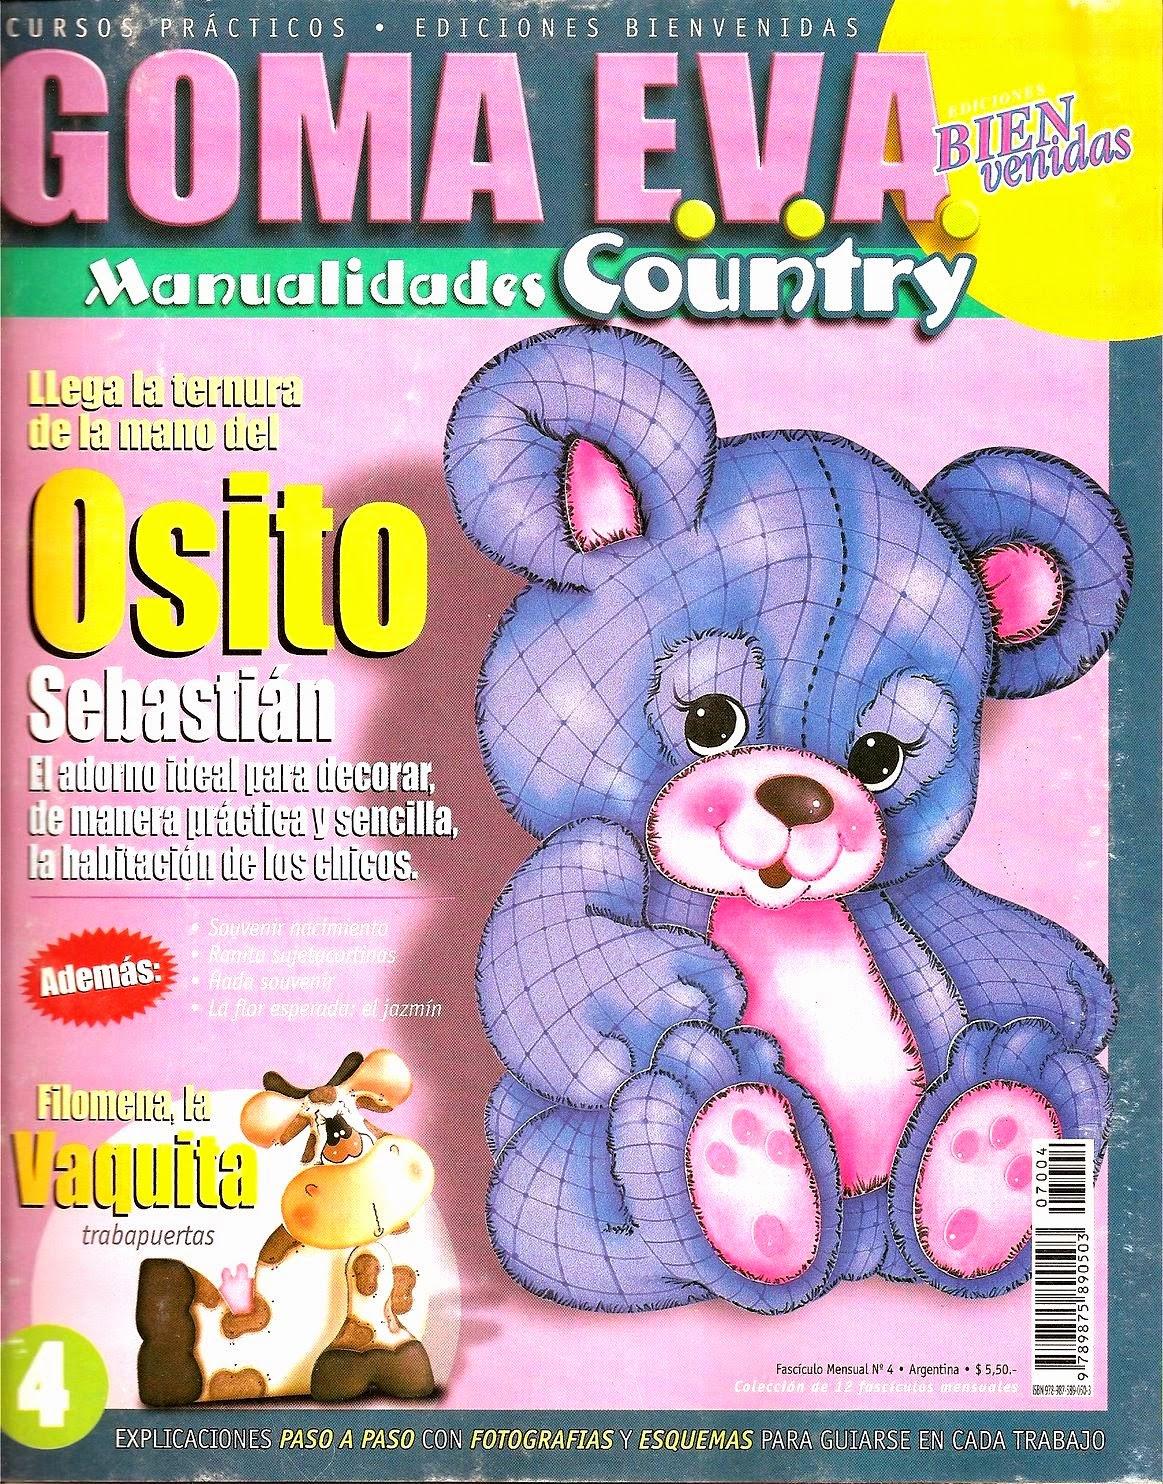 12 Revistas De Goma Eva Gratis Revistas De Manualidades Gratis - Como-trabajar-goma-eva